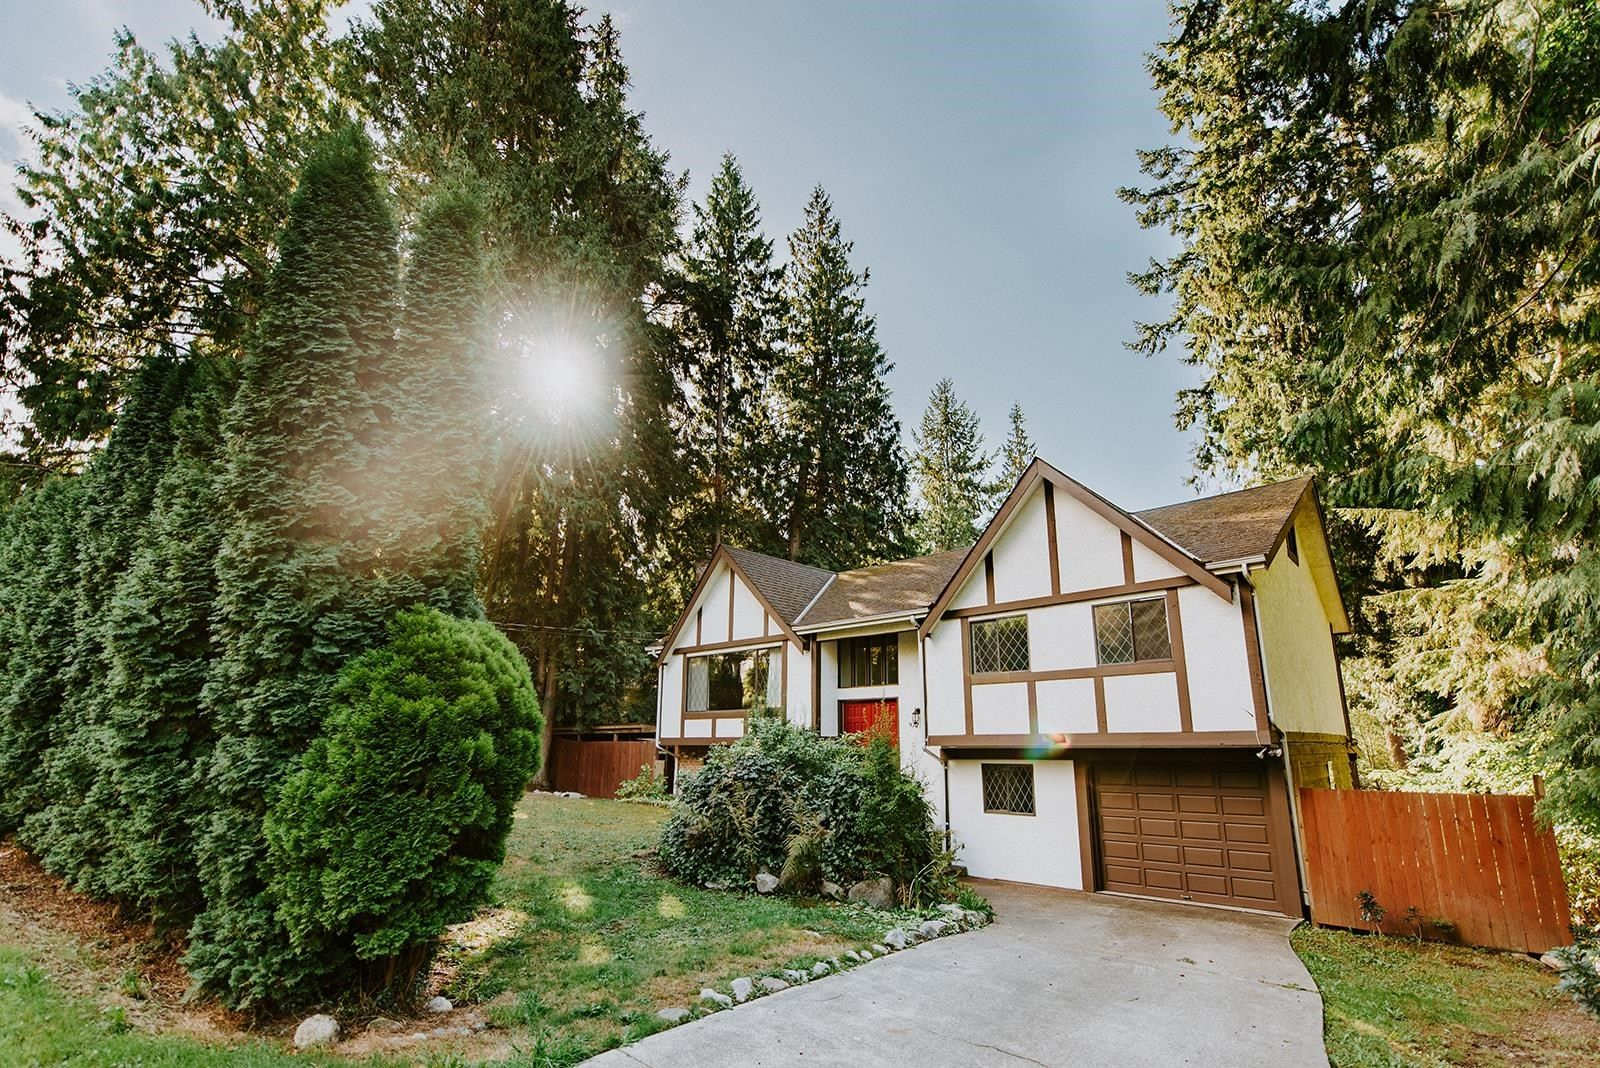 Main Photo: 972 CHERYL ANN PARK Road: Roberts Creek House for sale (Sunshine Coast)  : MLS®# R2618747